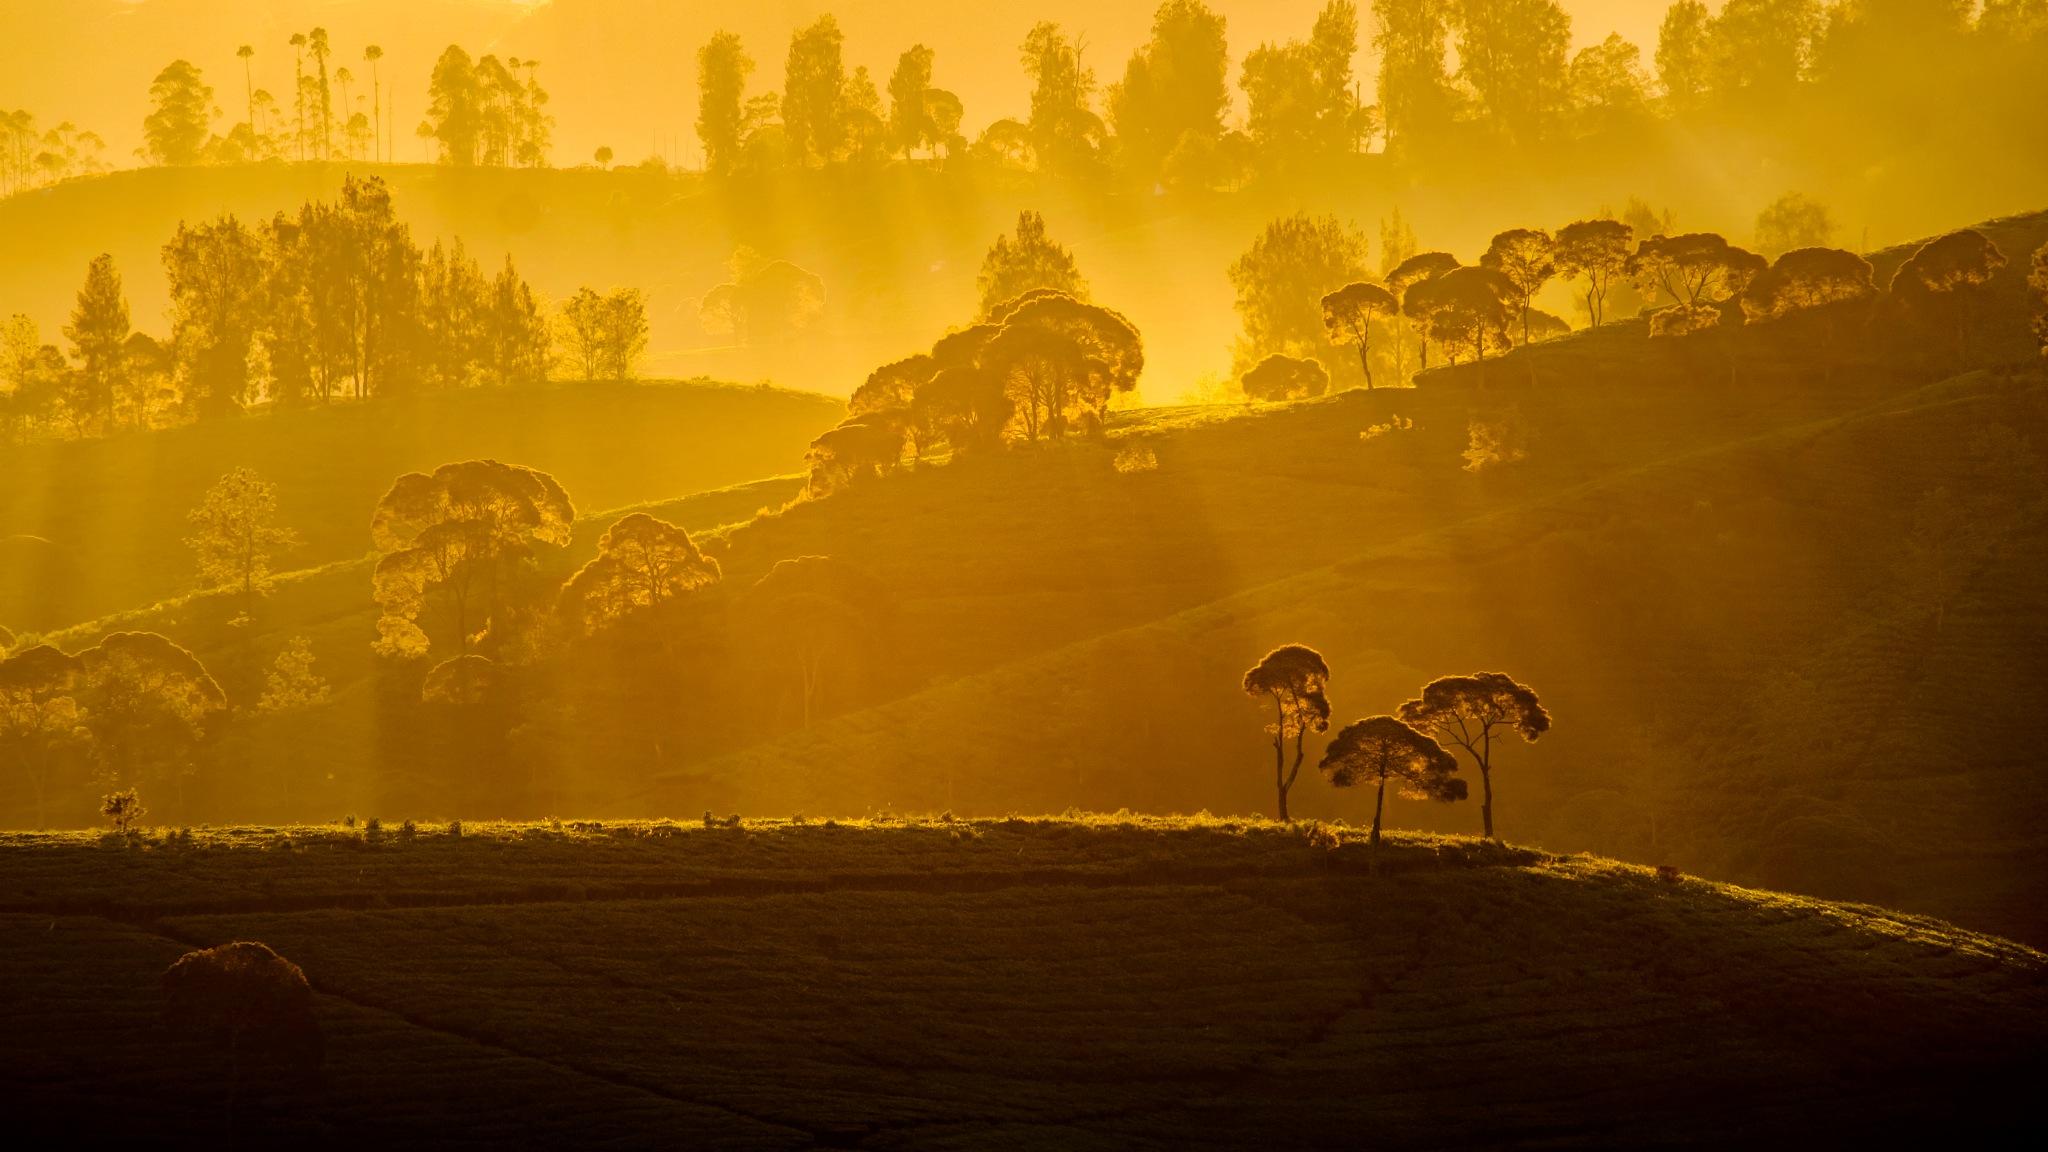 Morning Sunbath by Adnan Hidayat